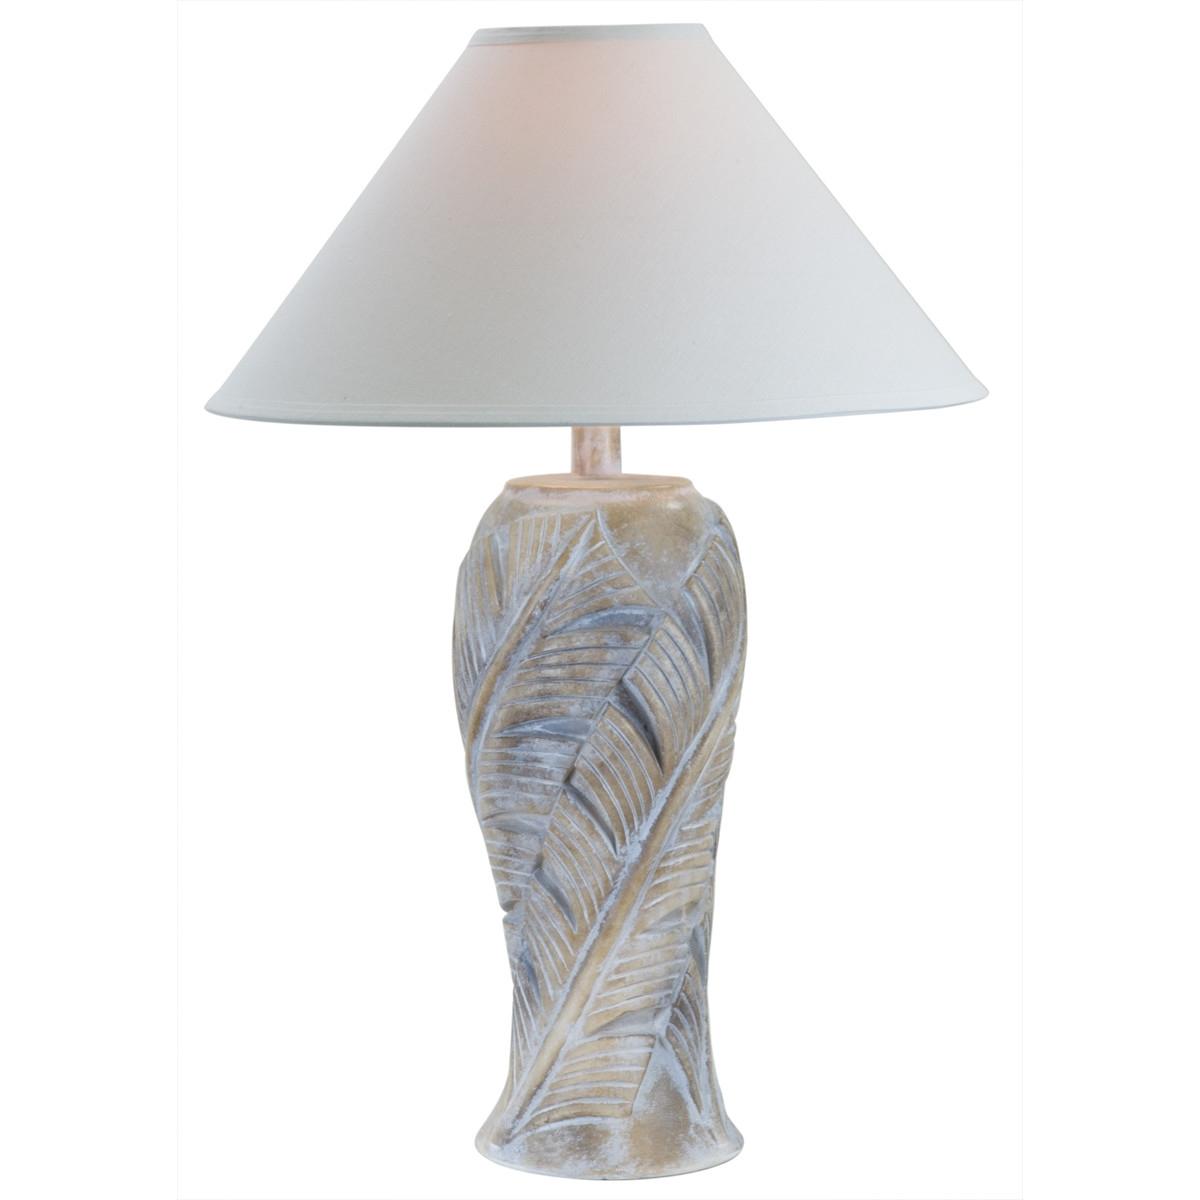 Anthony California Table Lamp In Dark